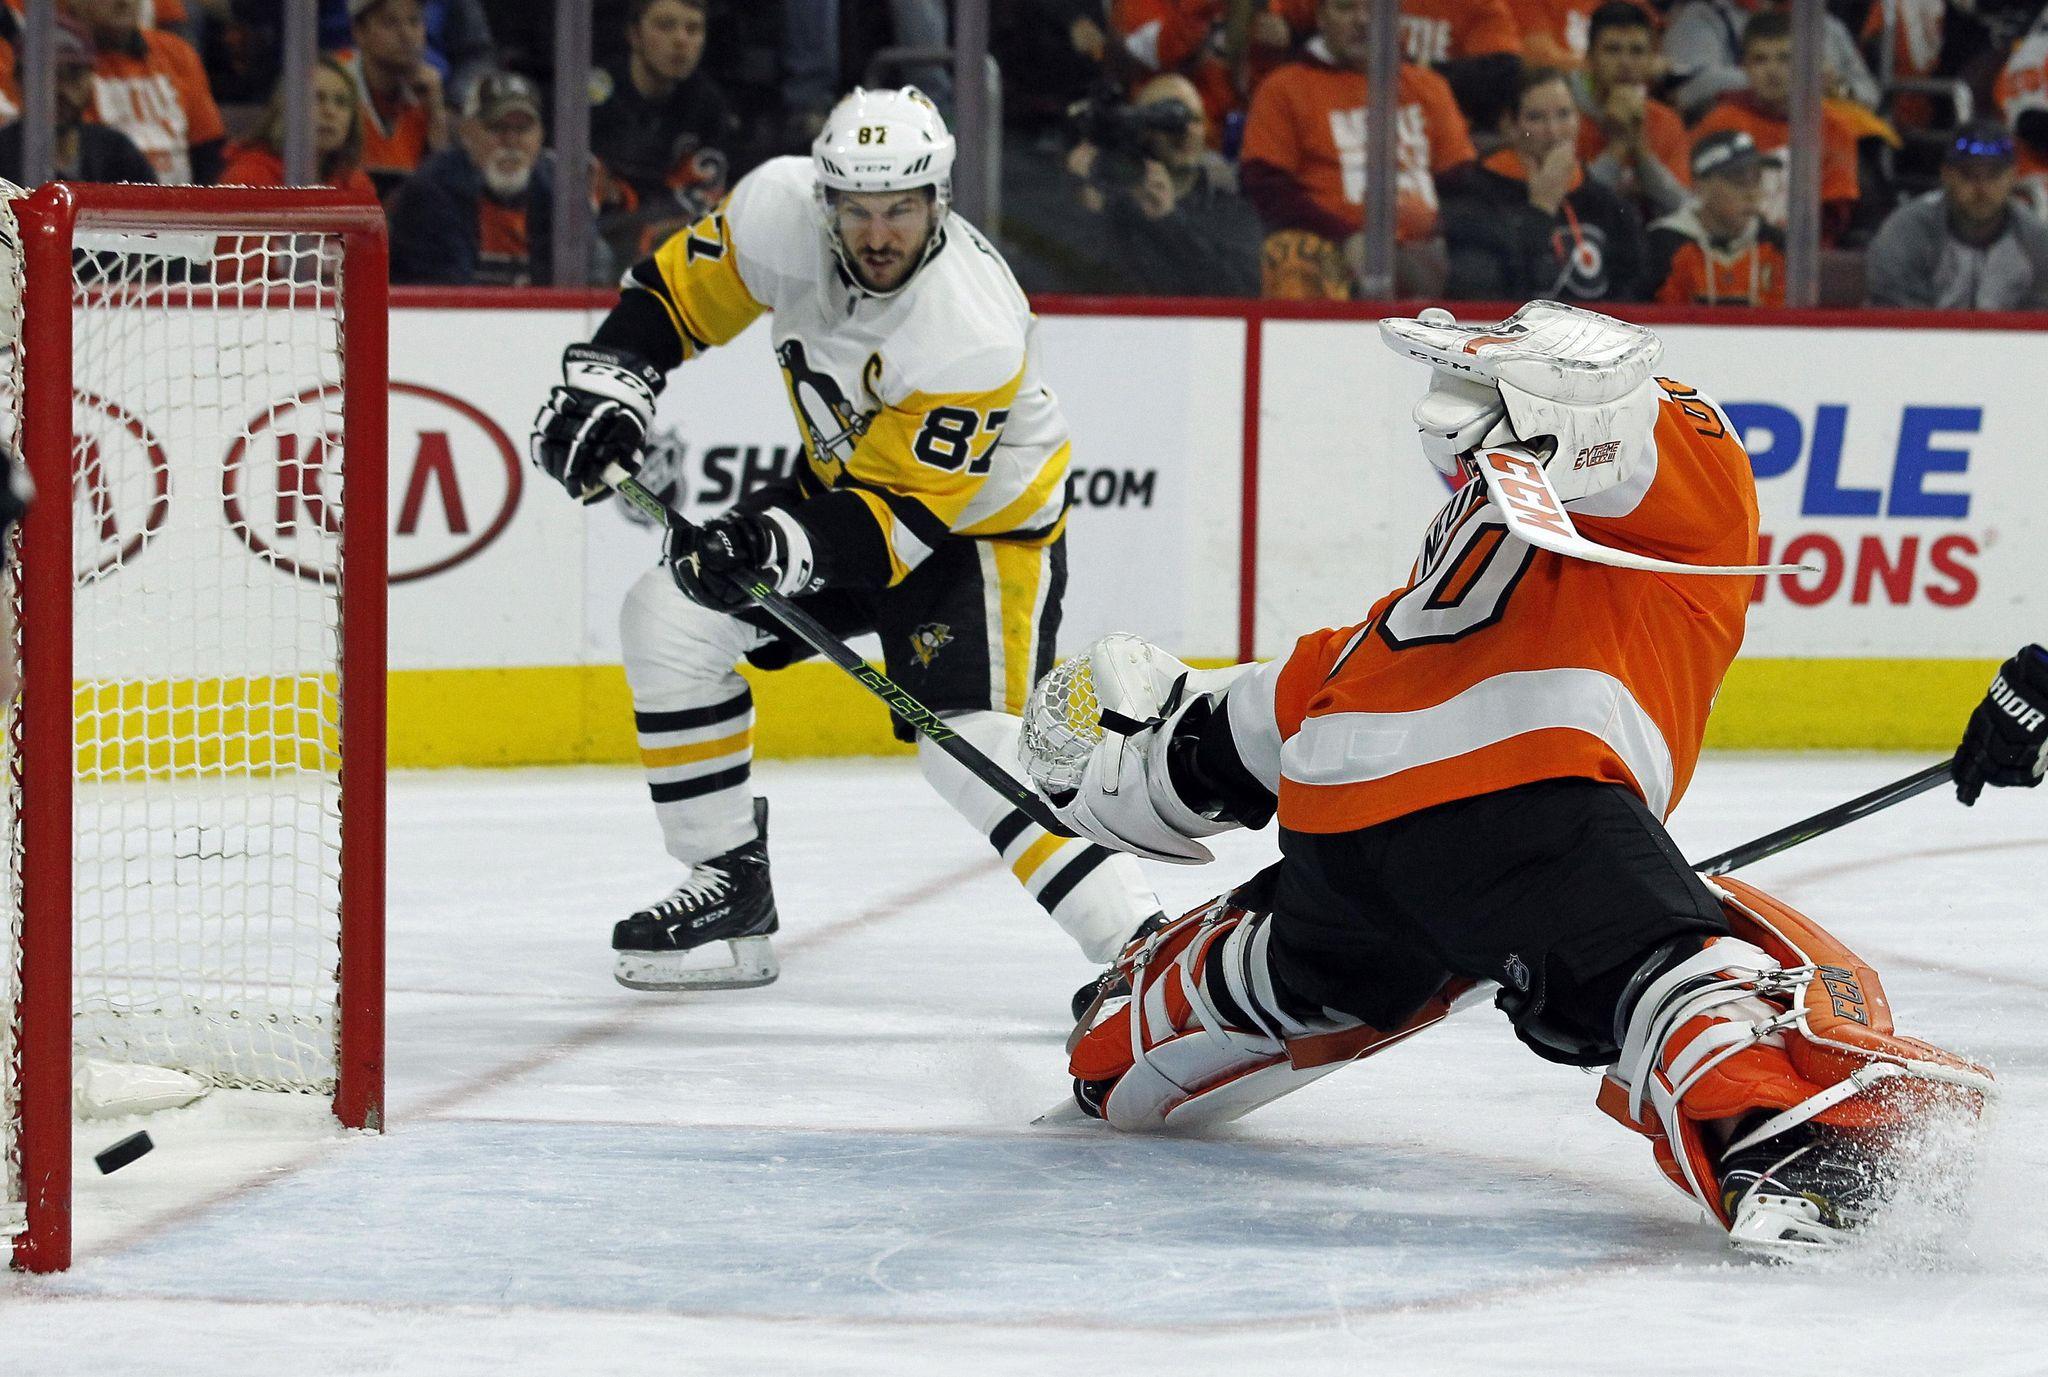 Penguins_flyers_hockey_81006_s2048x1377